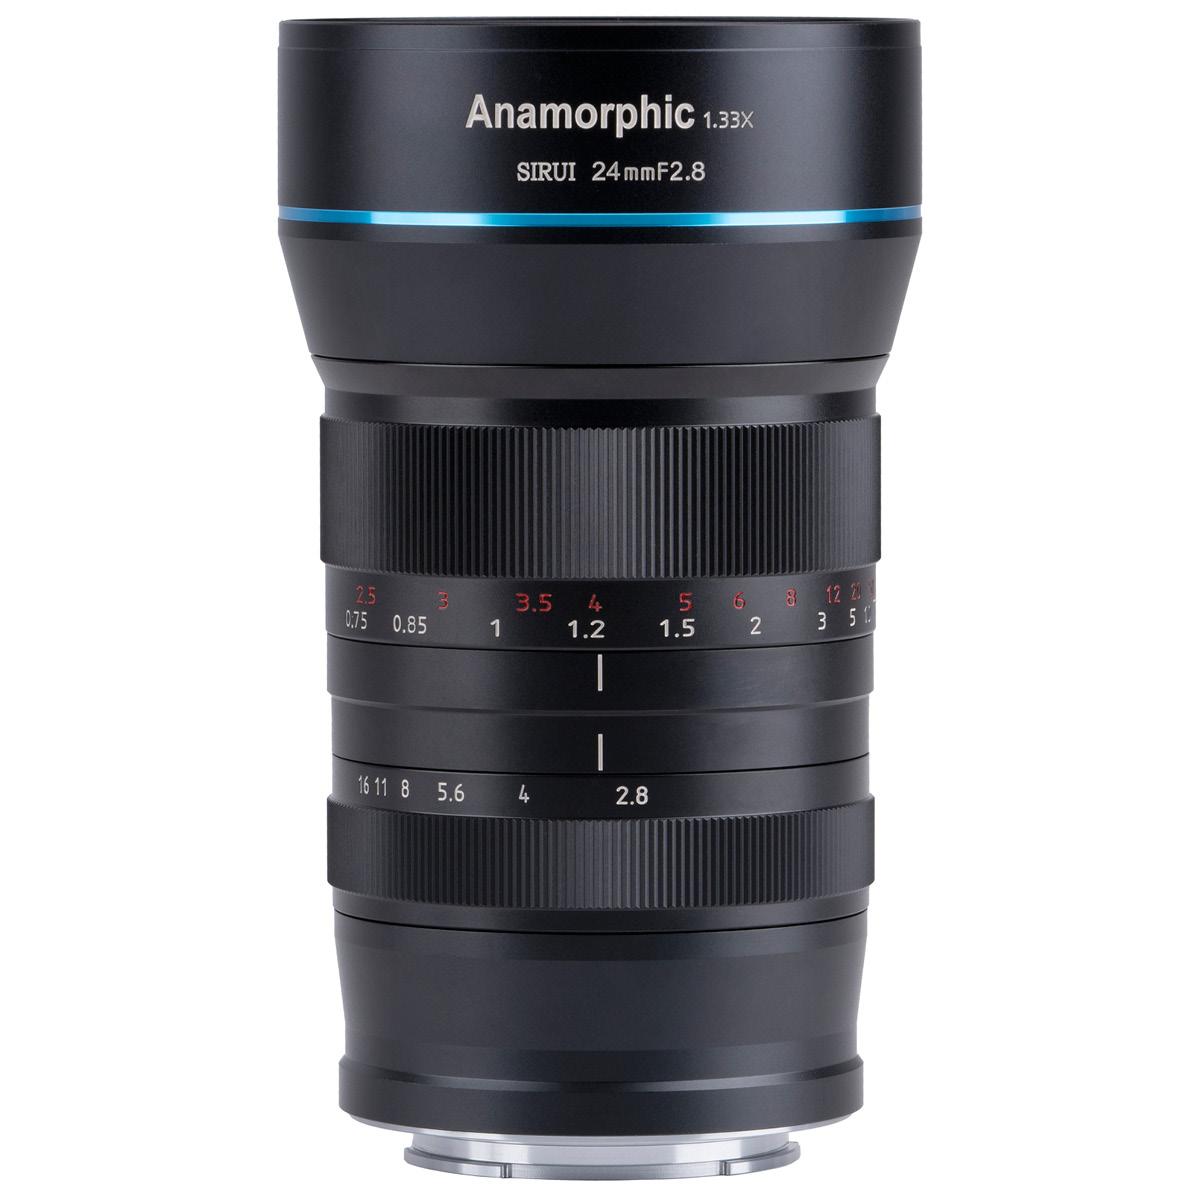 Sirui 24 mm 1:2,8 Anamorph 1,33x für Sony E-Mount